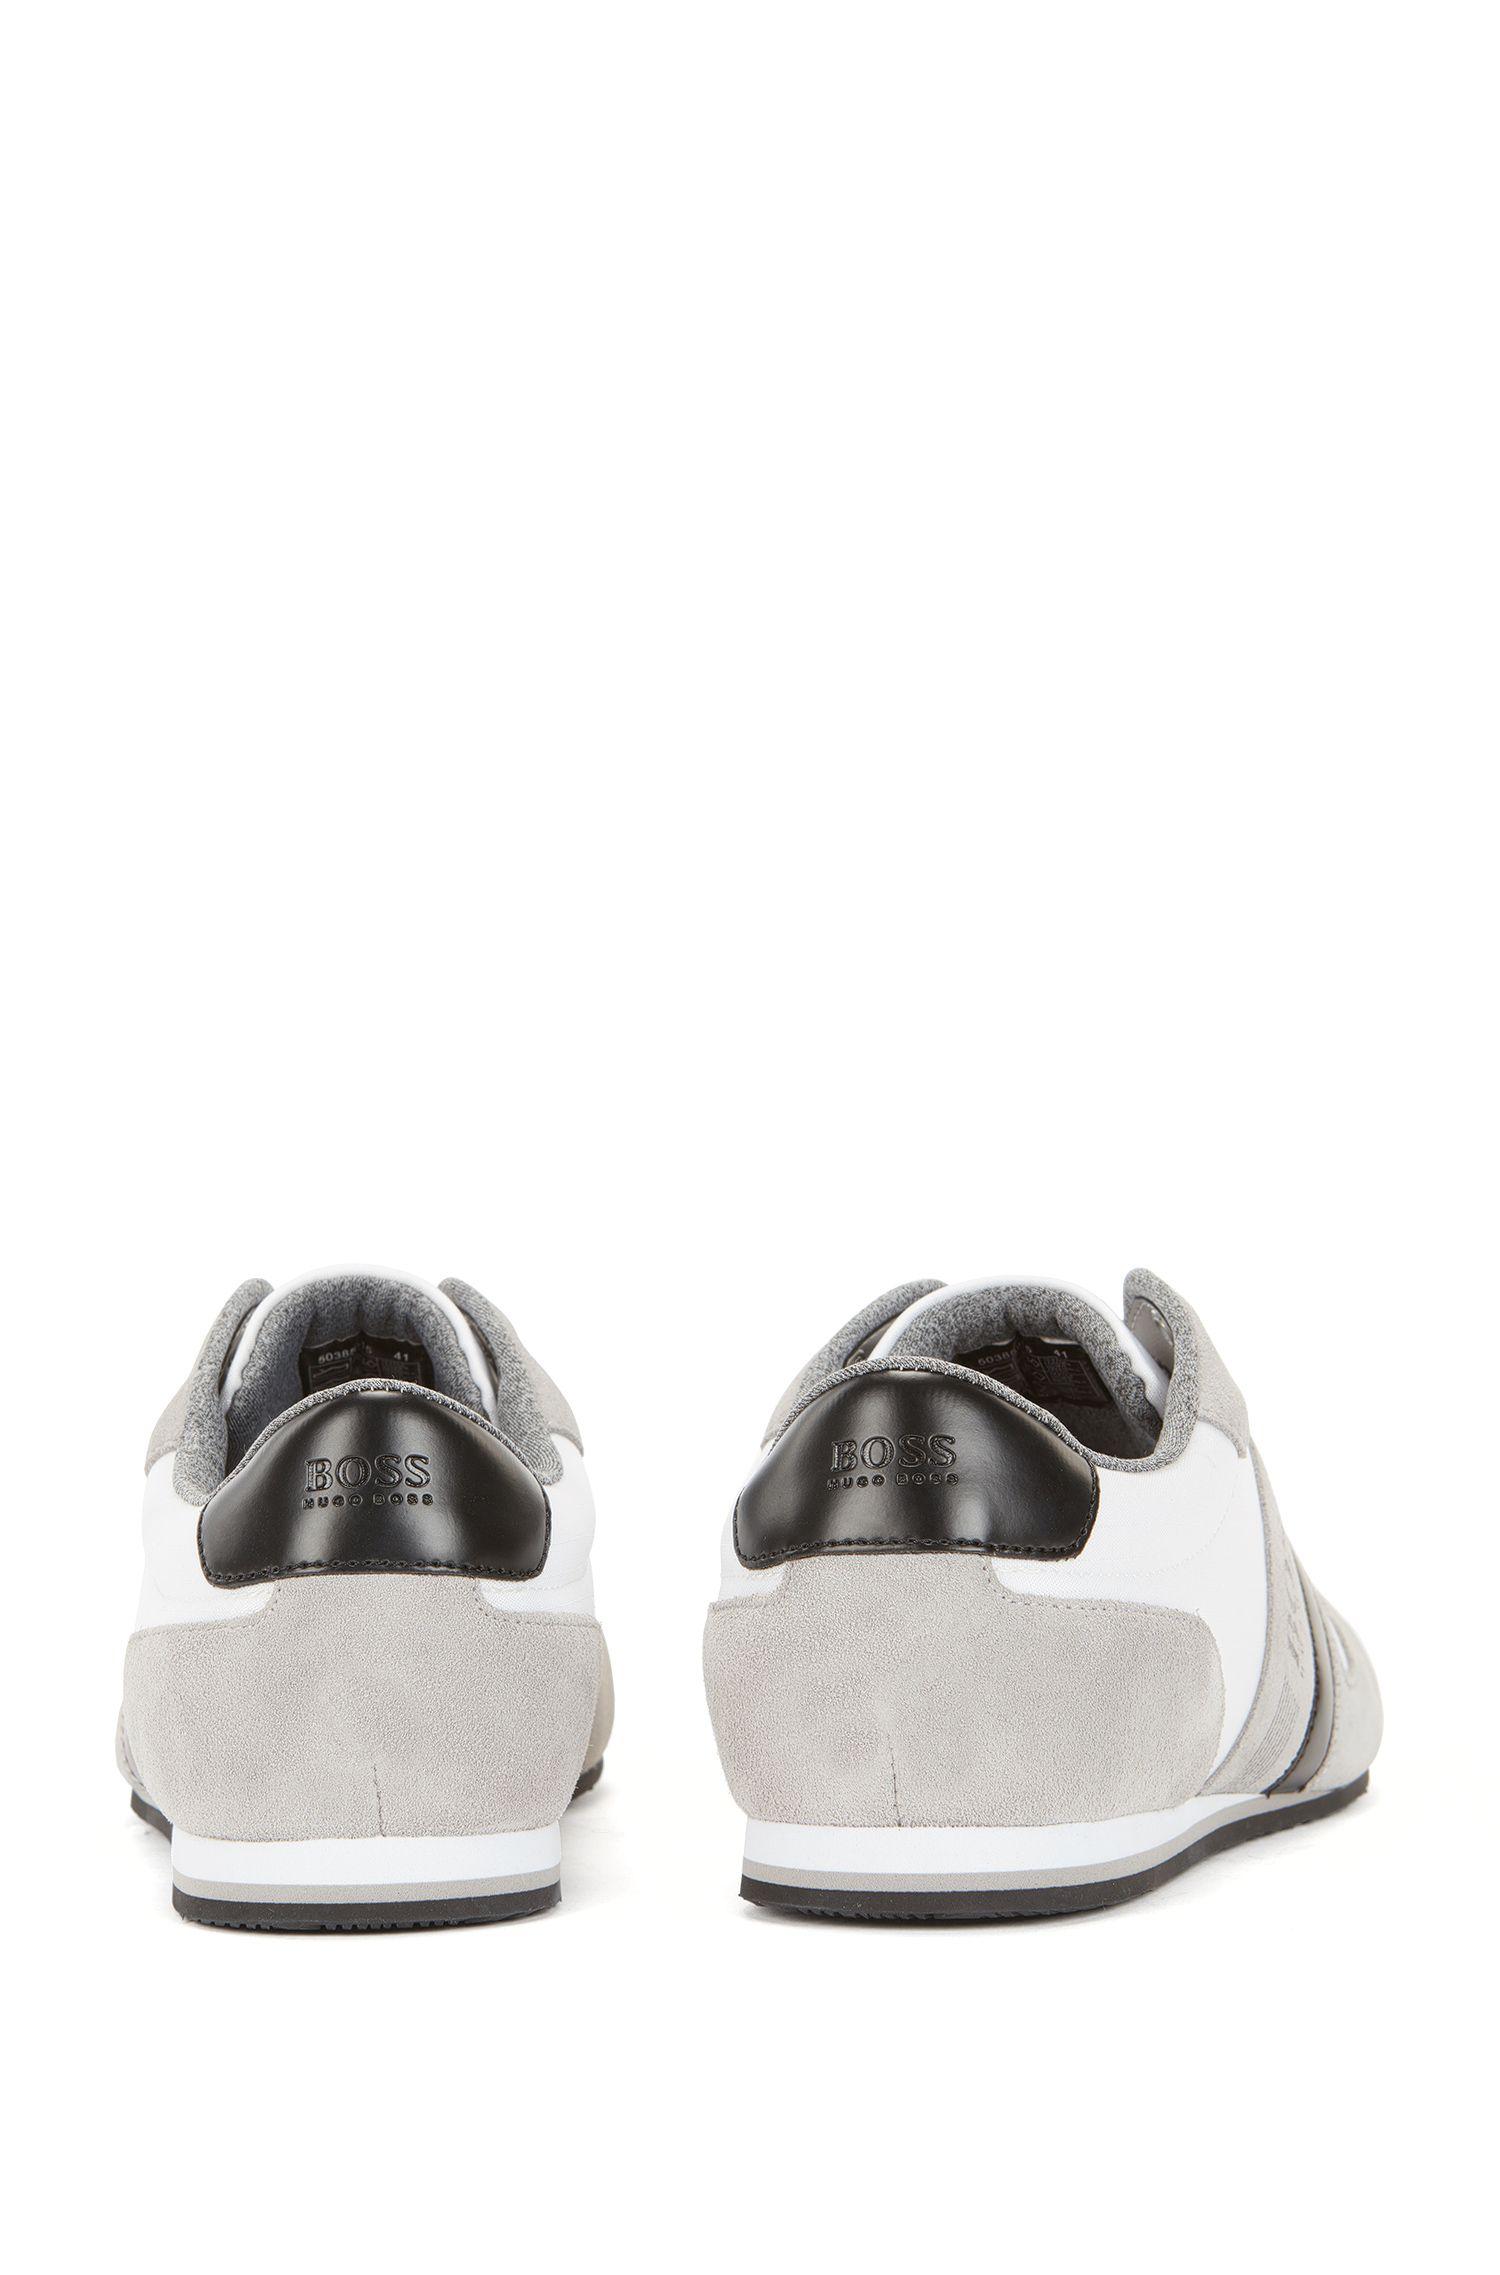 Sneakers aus Material-Mix mit Veloursleder-Details